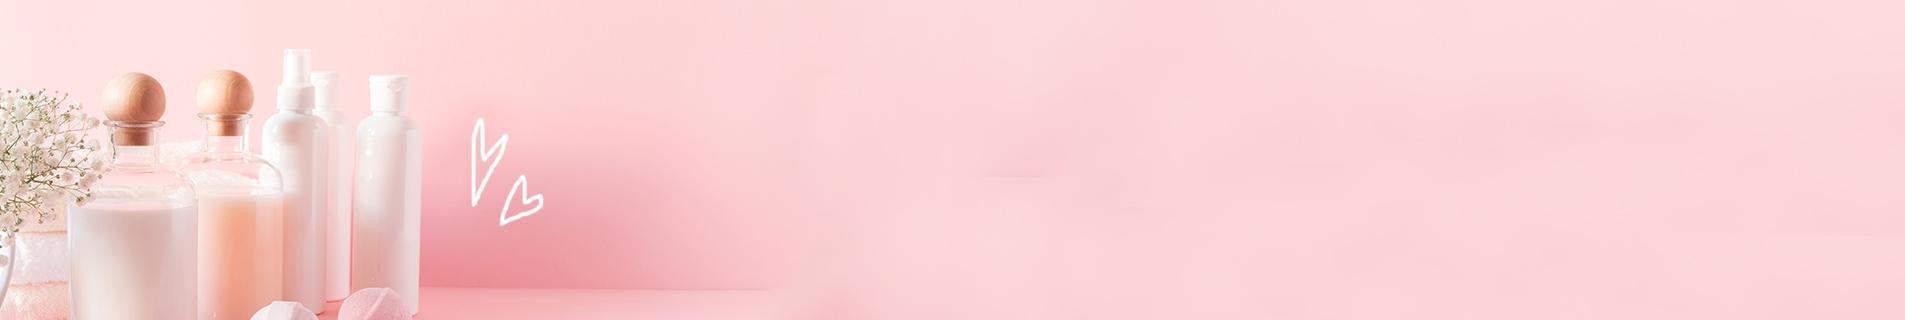 Promo moins de 10€   Site de cosmétique pas cher   SAGA Cosmetics